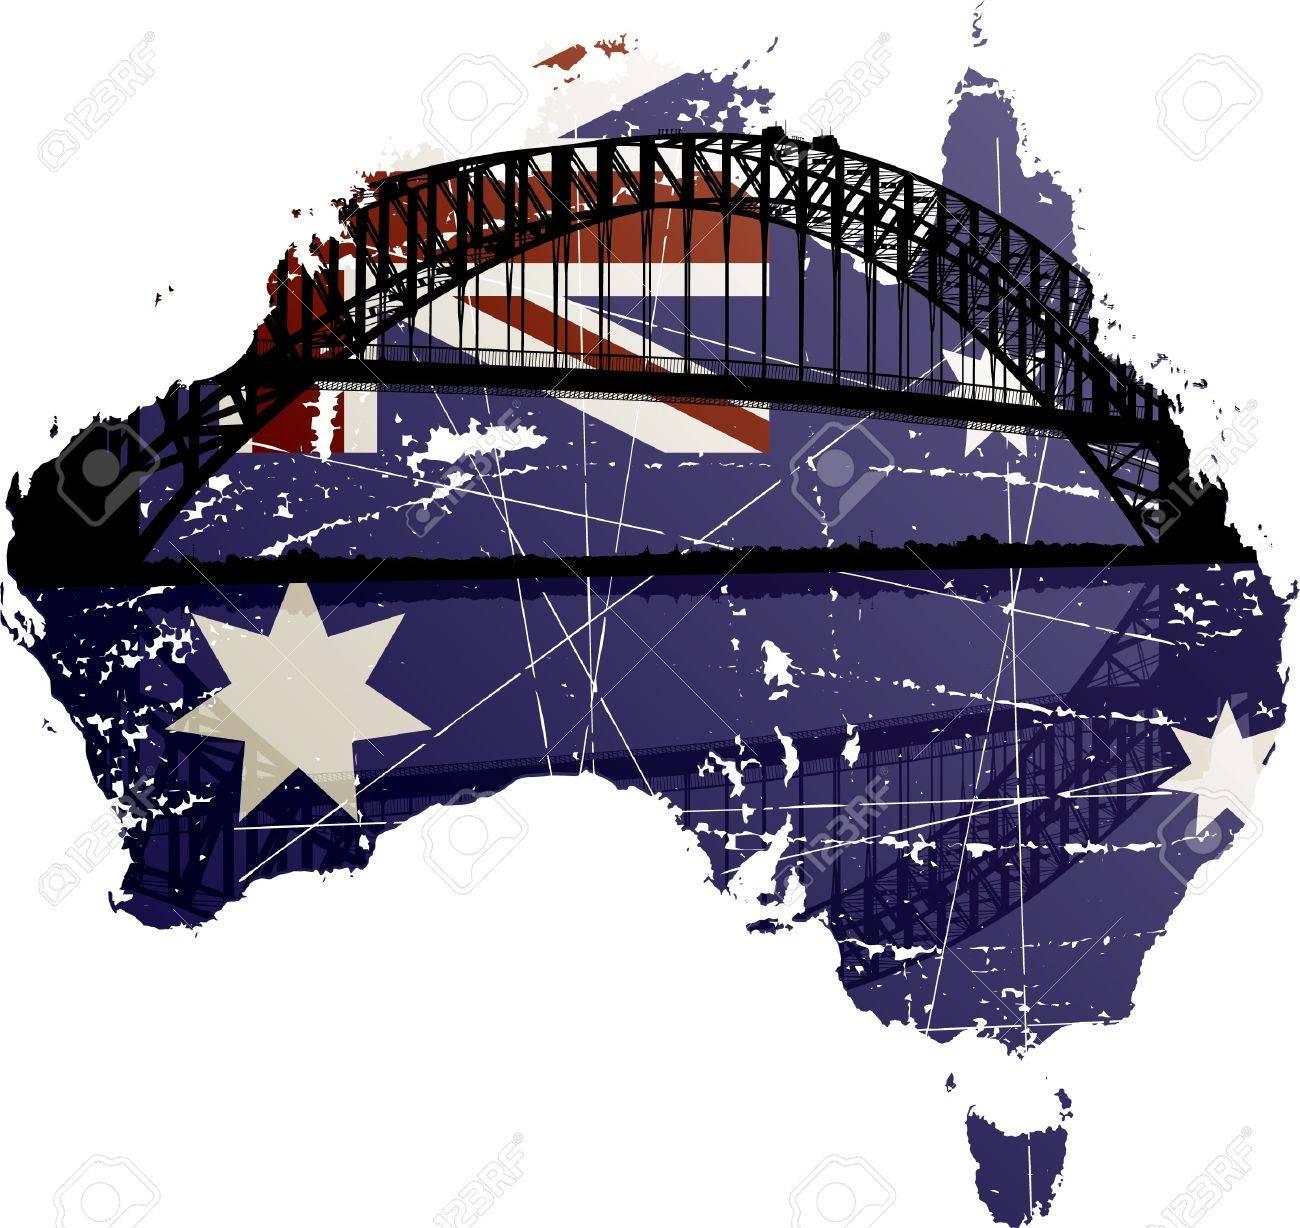 Australia Sydney Harbour Bridge Stock Vector - 12474786